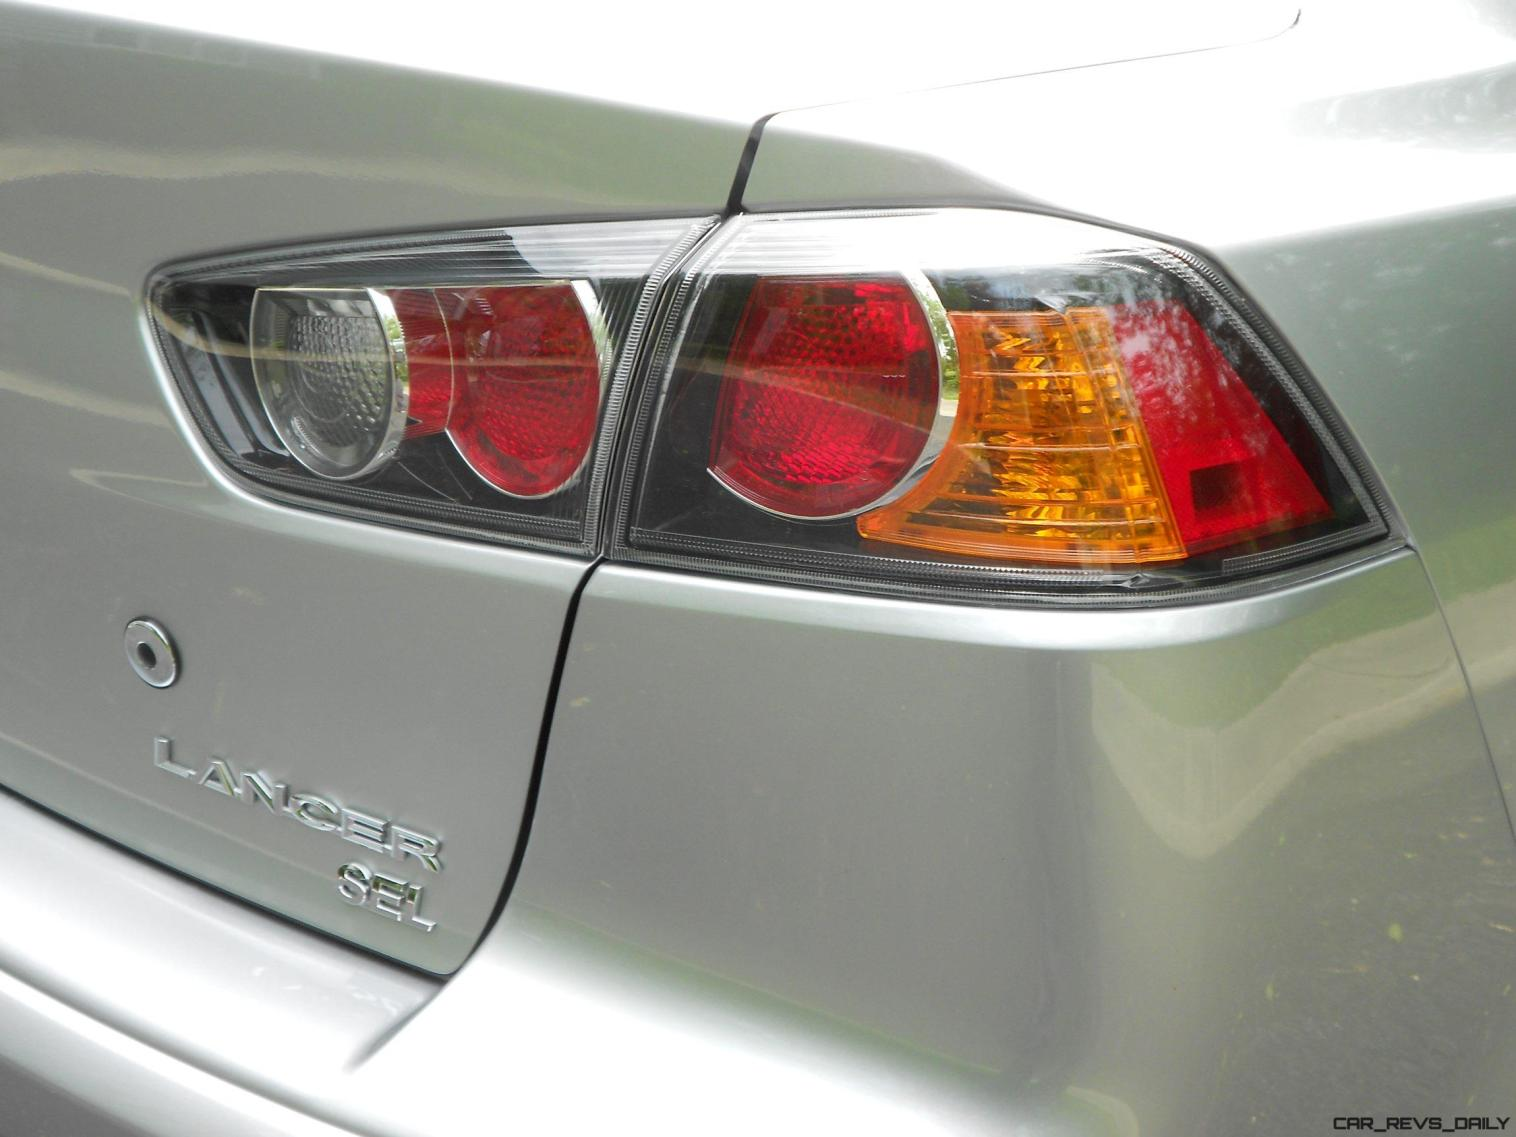 Drive Review - 2016 Mitsubishi Lancer 2